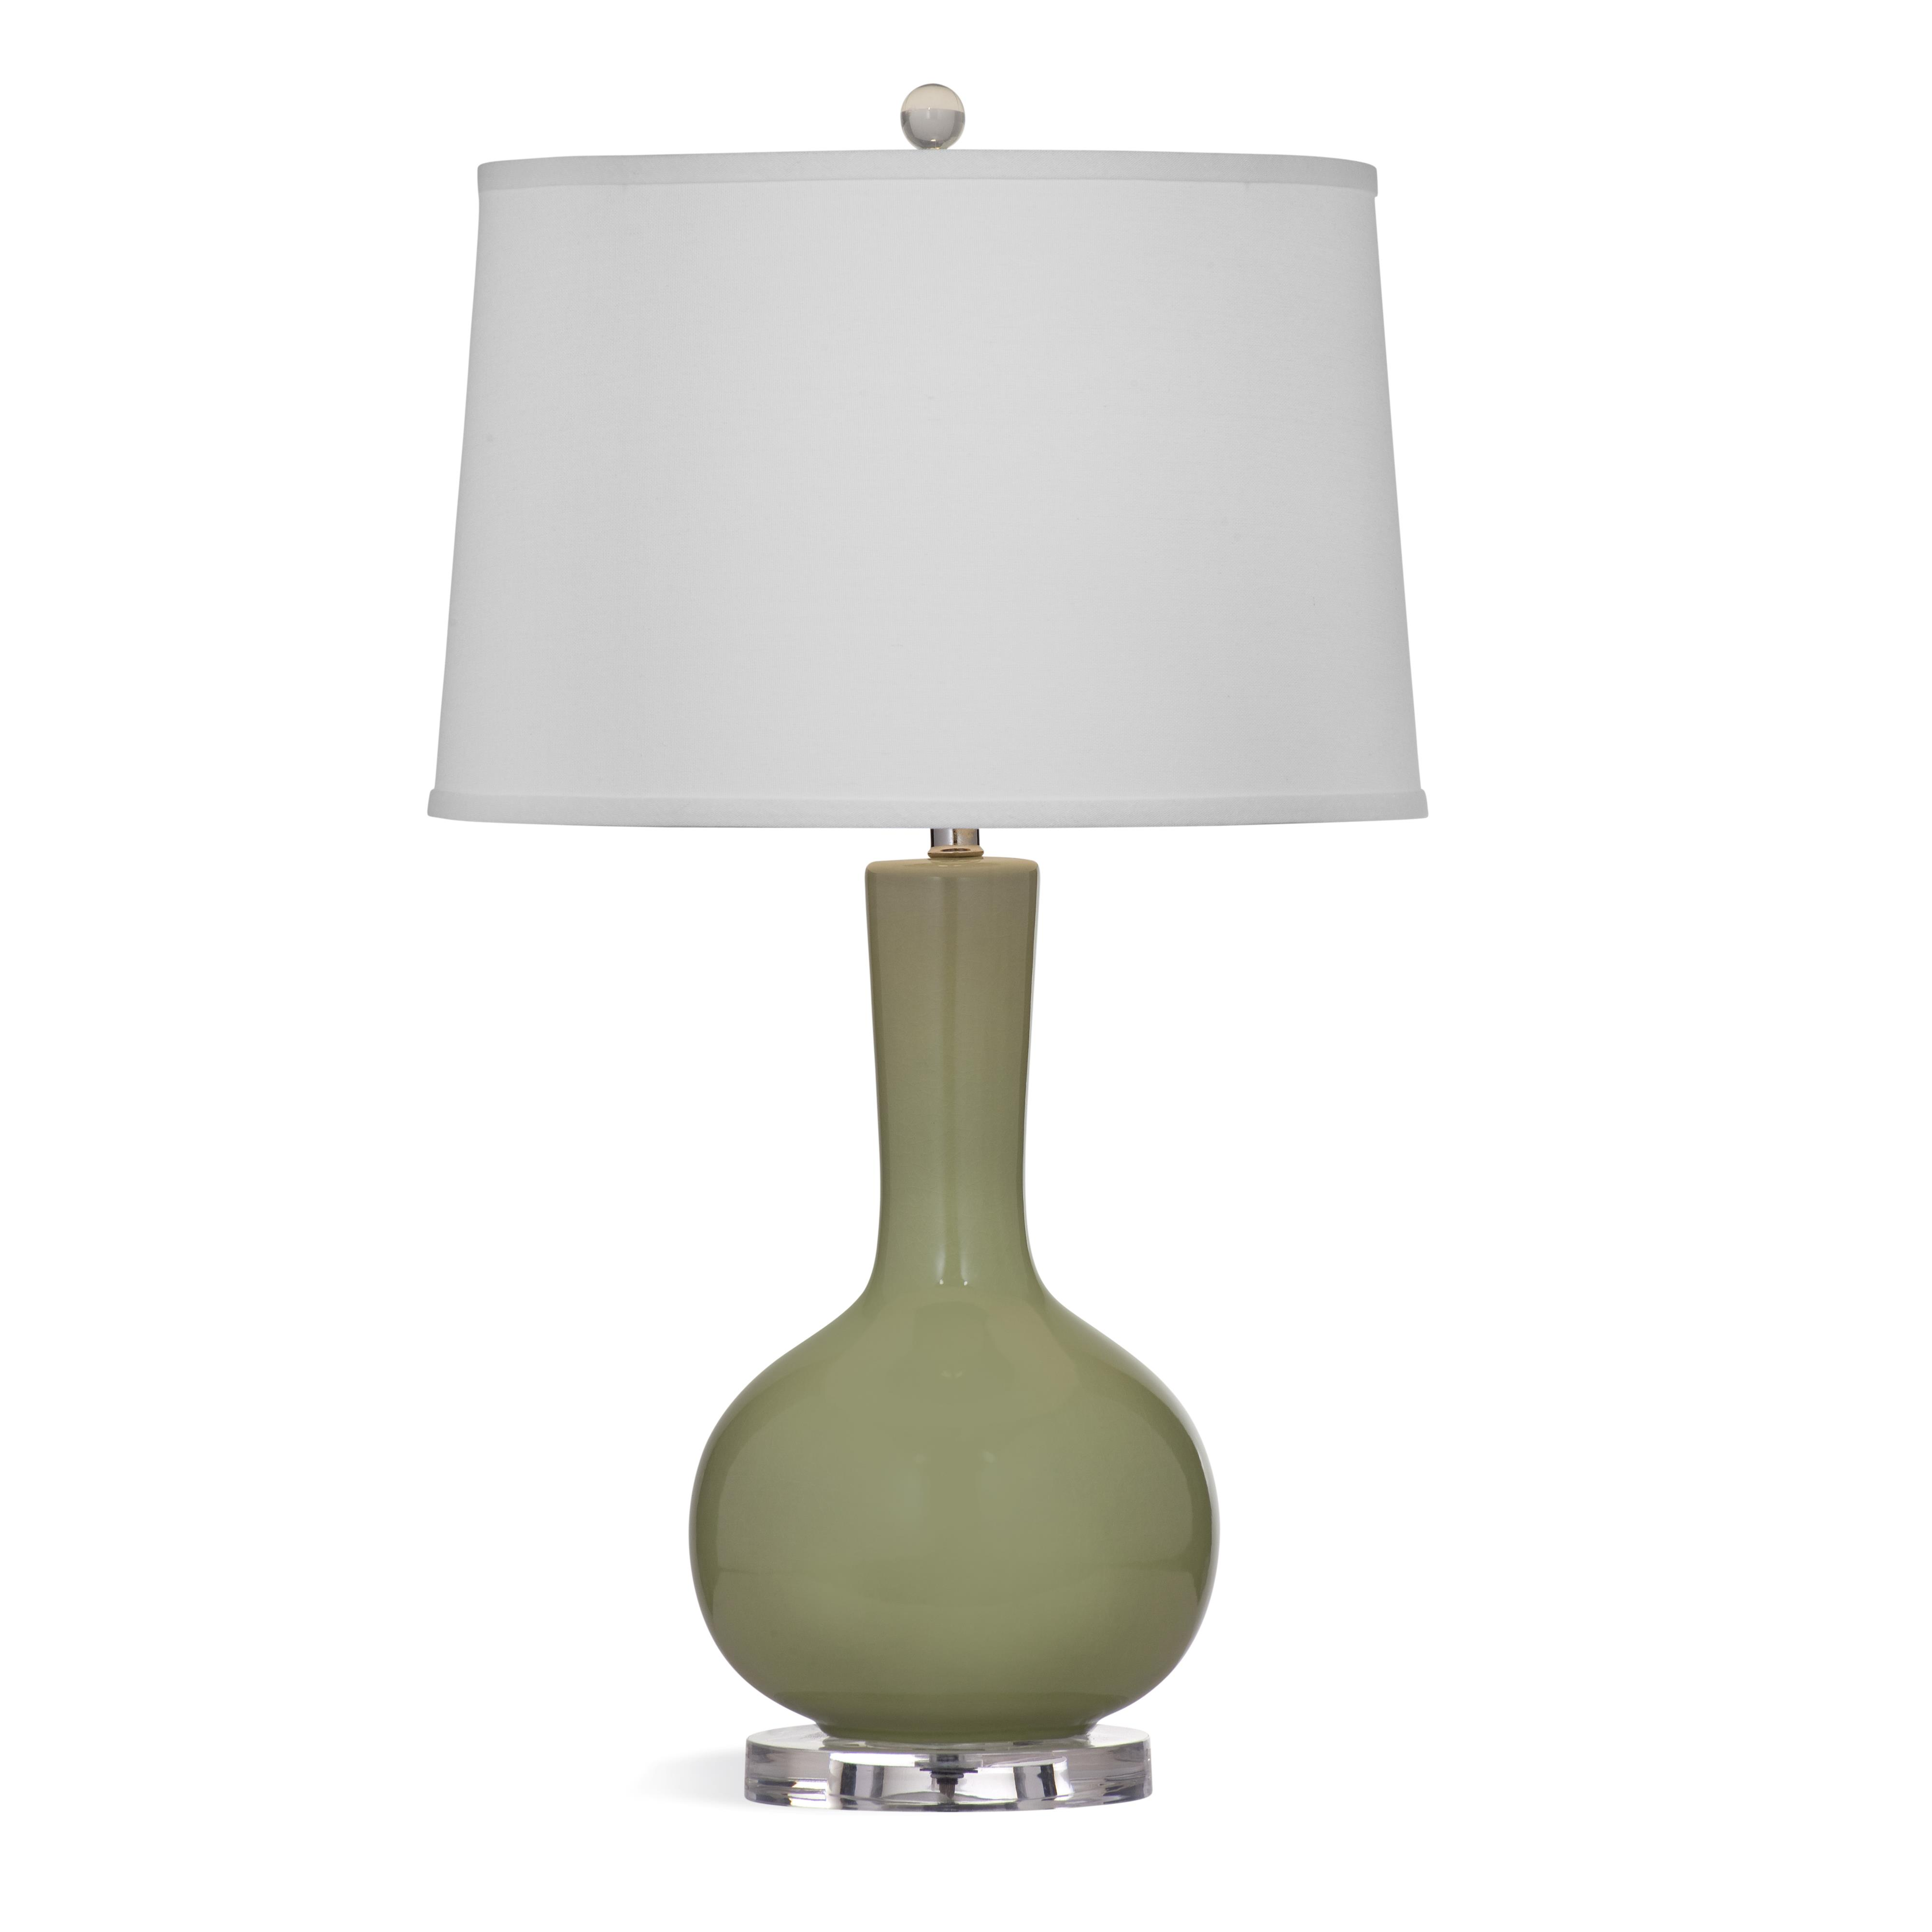 Pratt Table Lamp